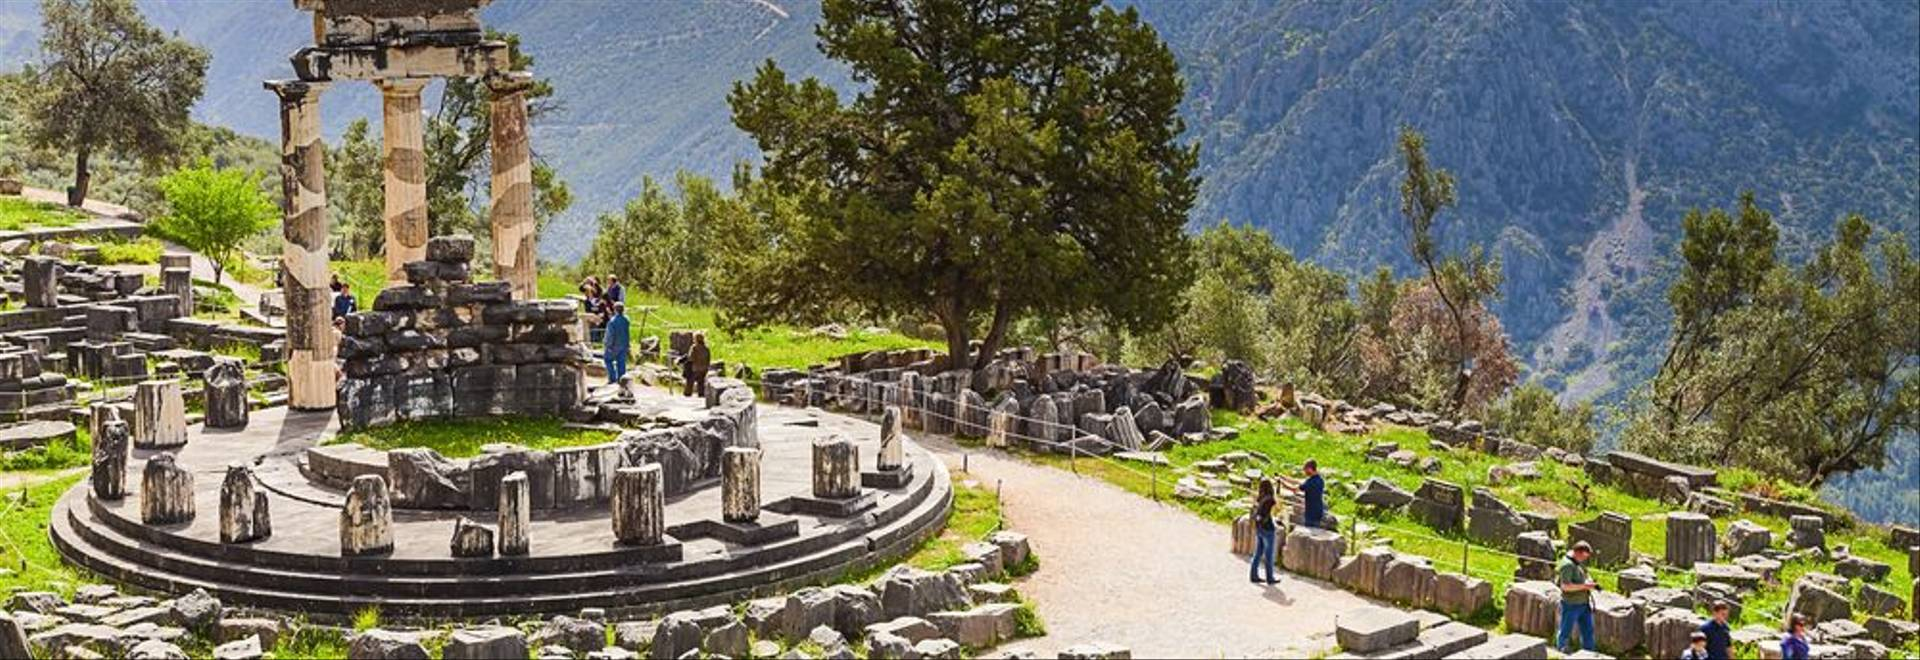 Delphi Shutterstock 158297948   Main